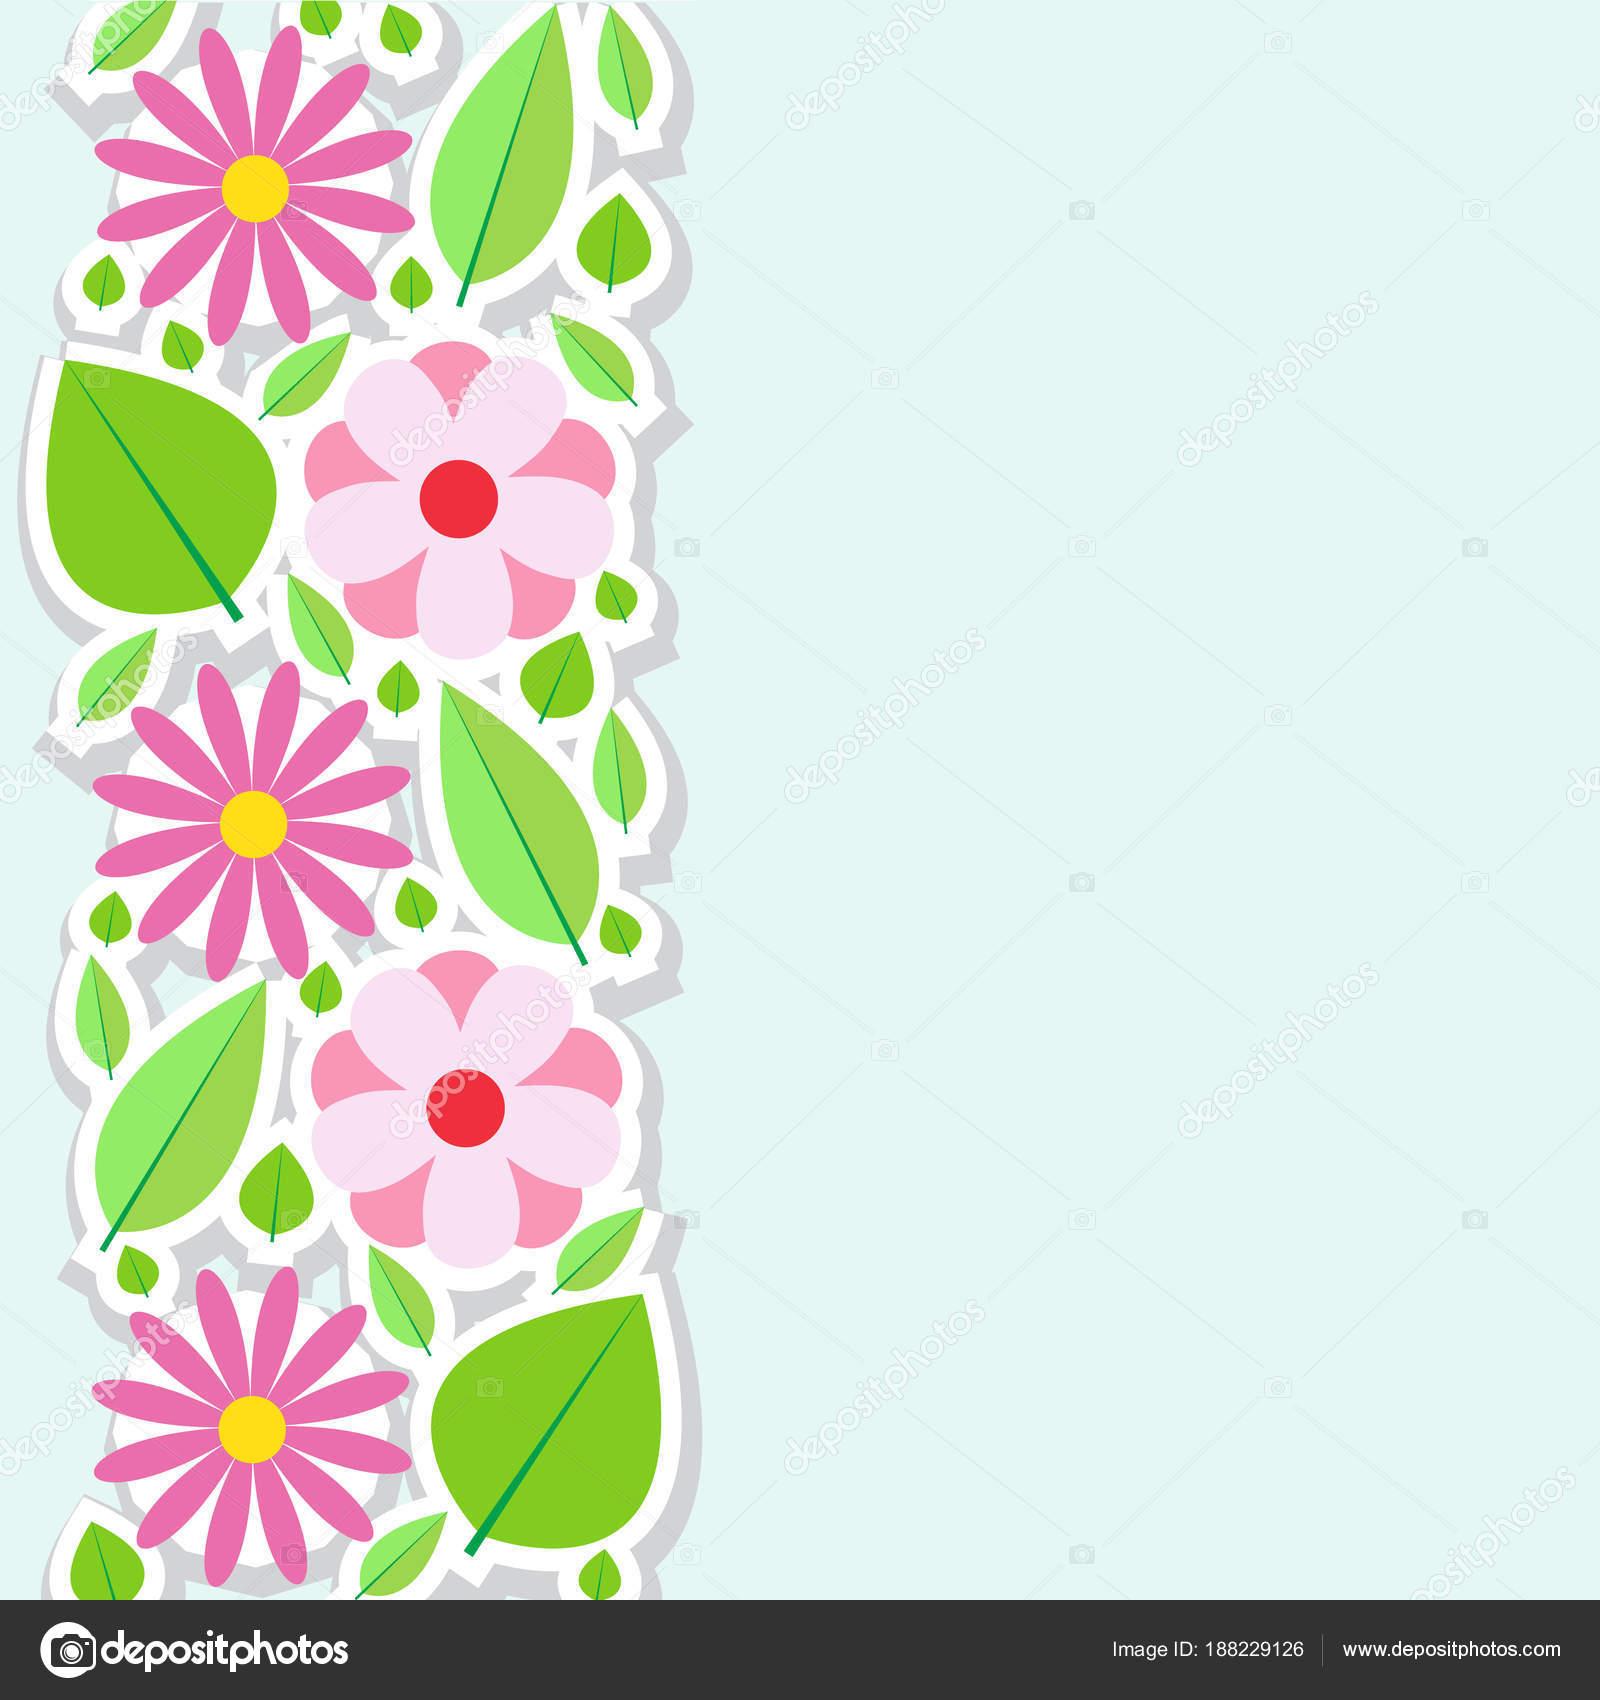 Spring flowers border vector illustration stock vector spring flowers border vector illustration stock vector mightylinksfo